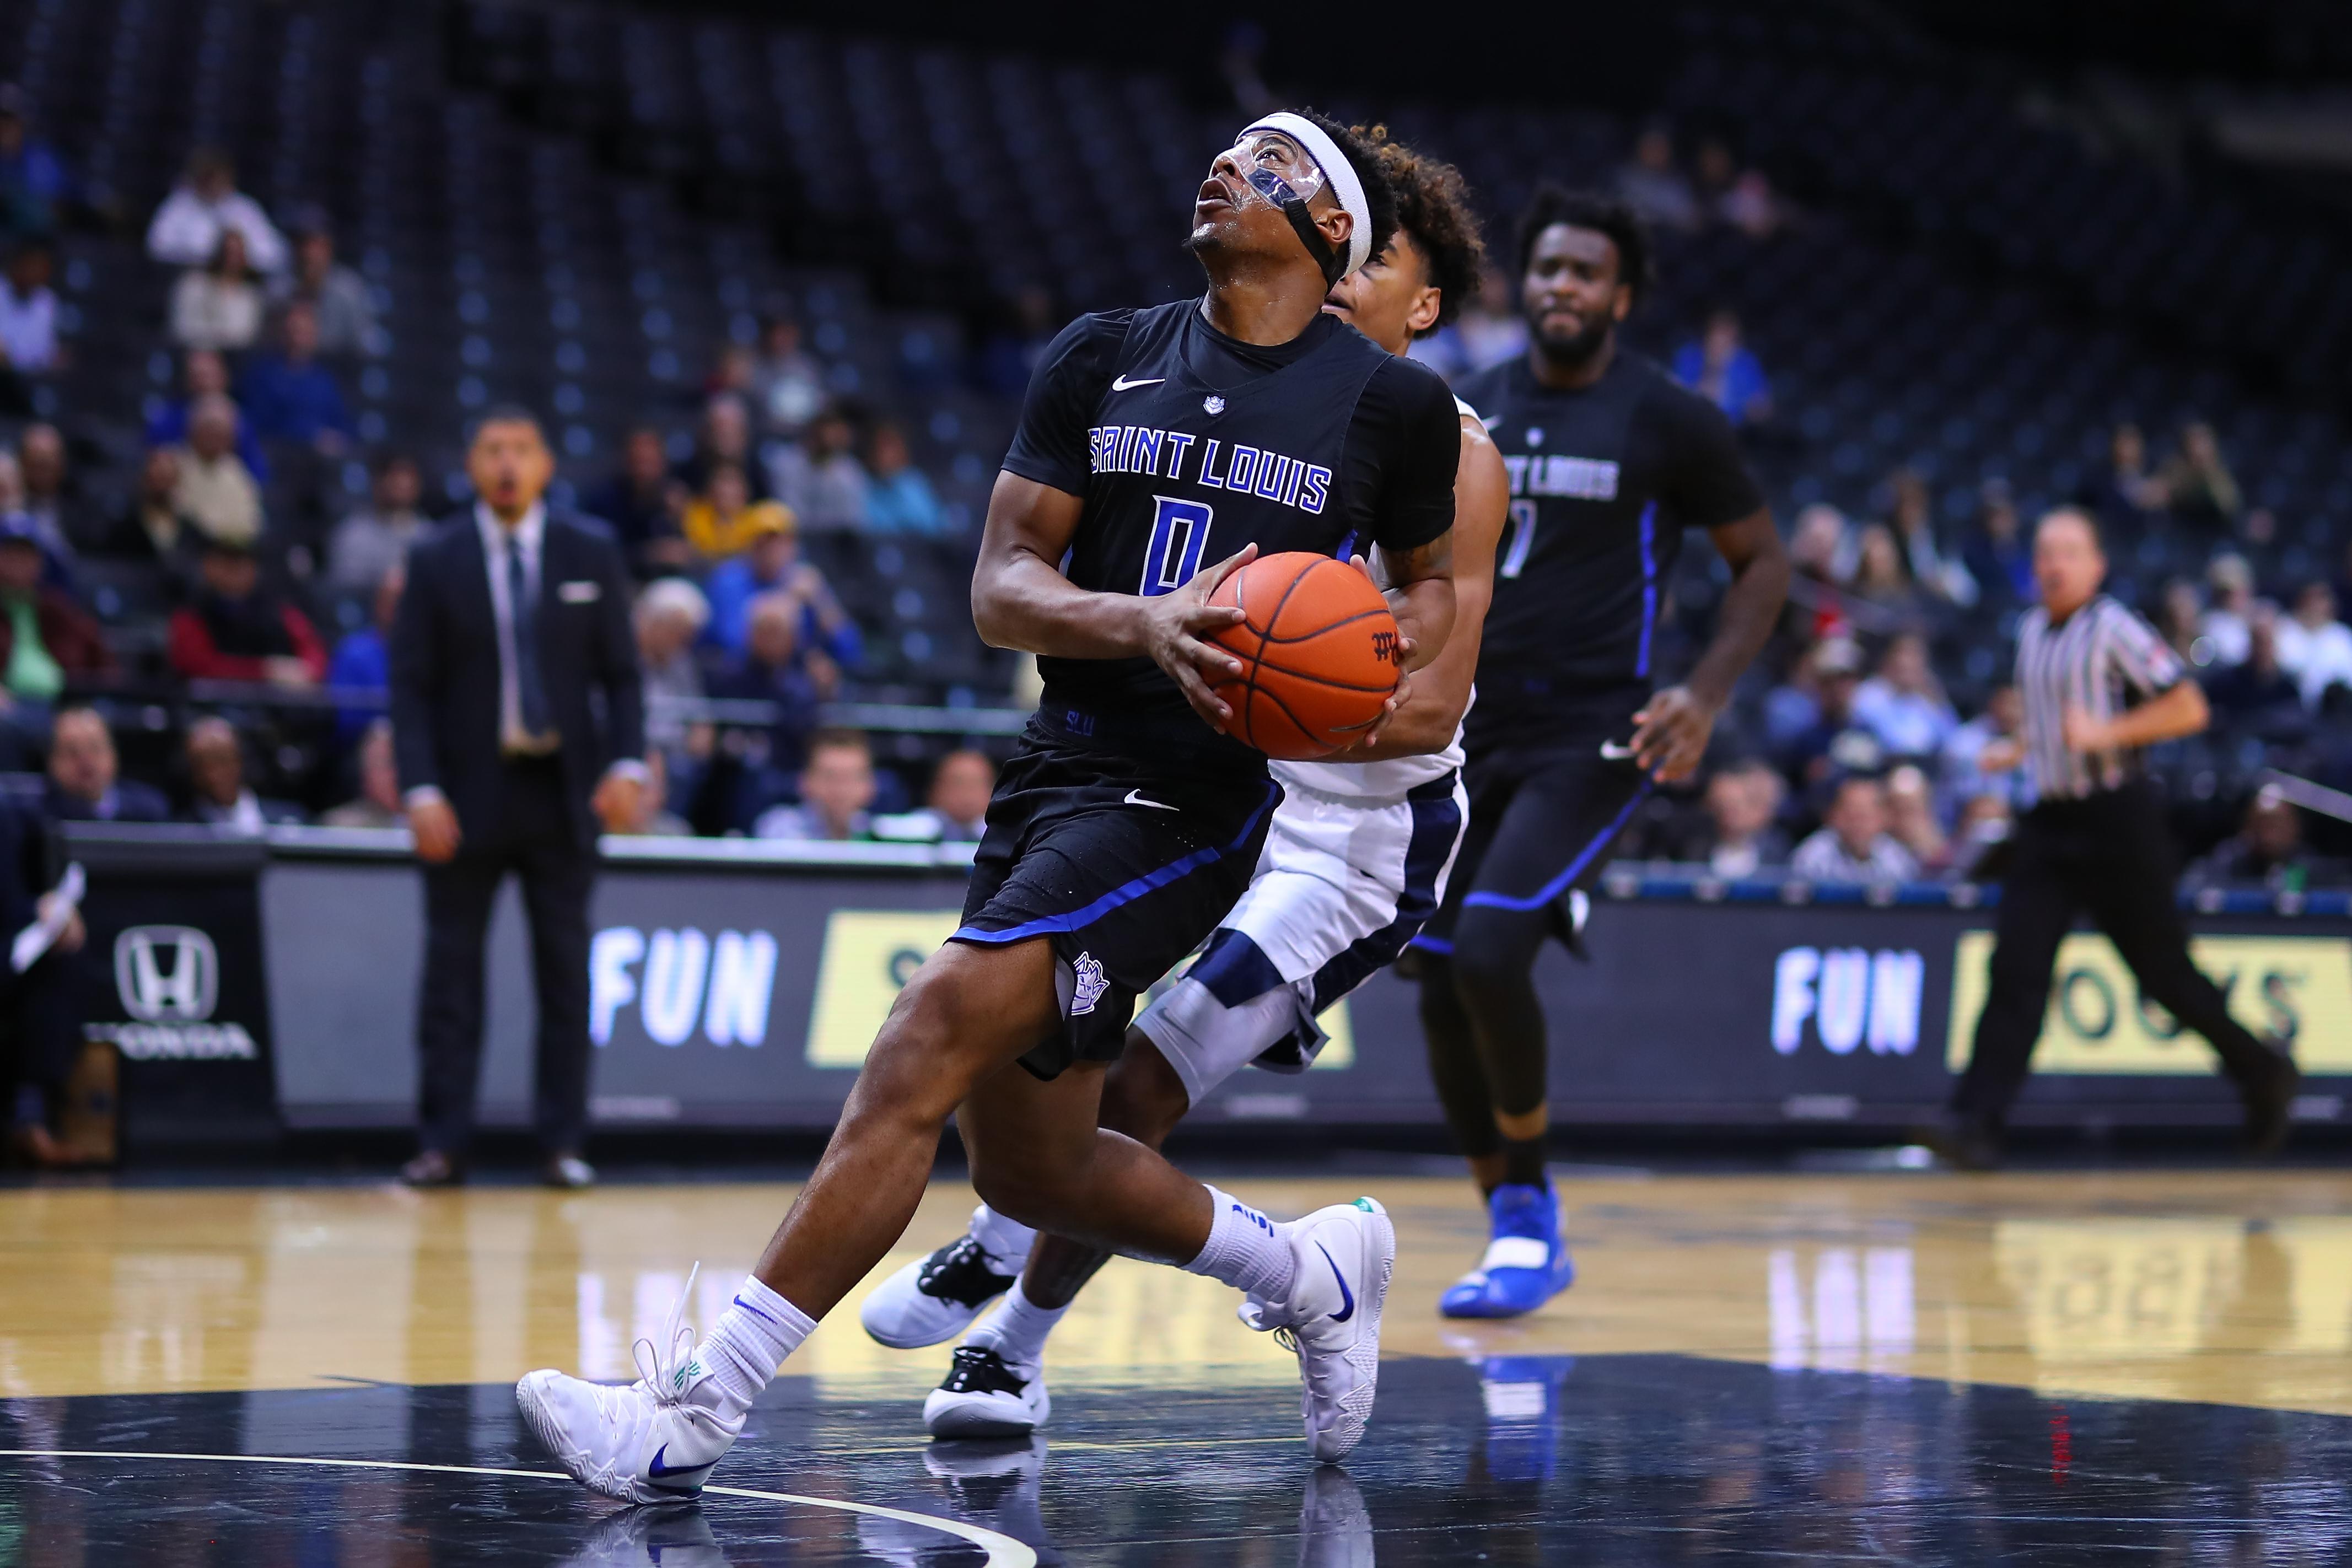 COLLEGE BASKETBALL: NOV 21 Barclays Center Classic - Saint Louis v Pitt